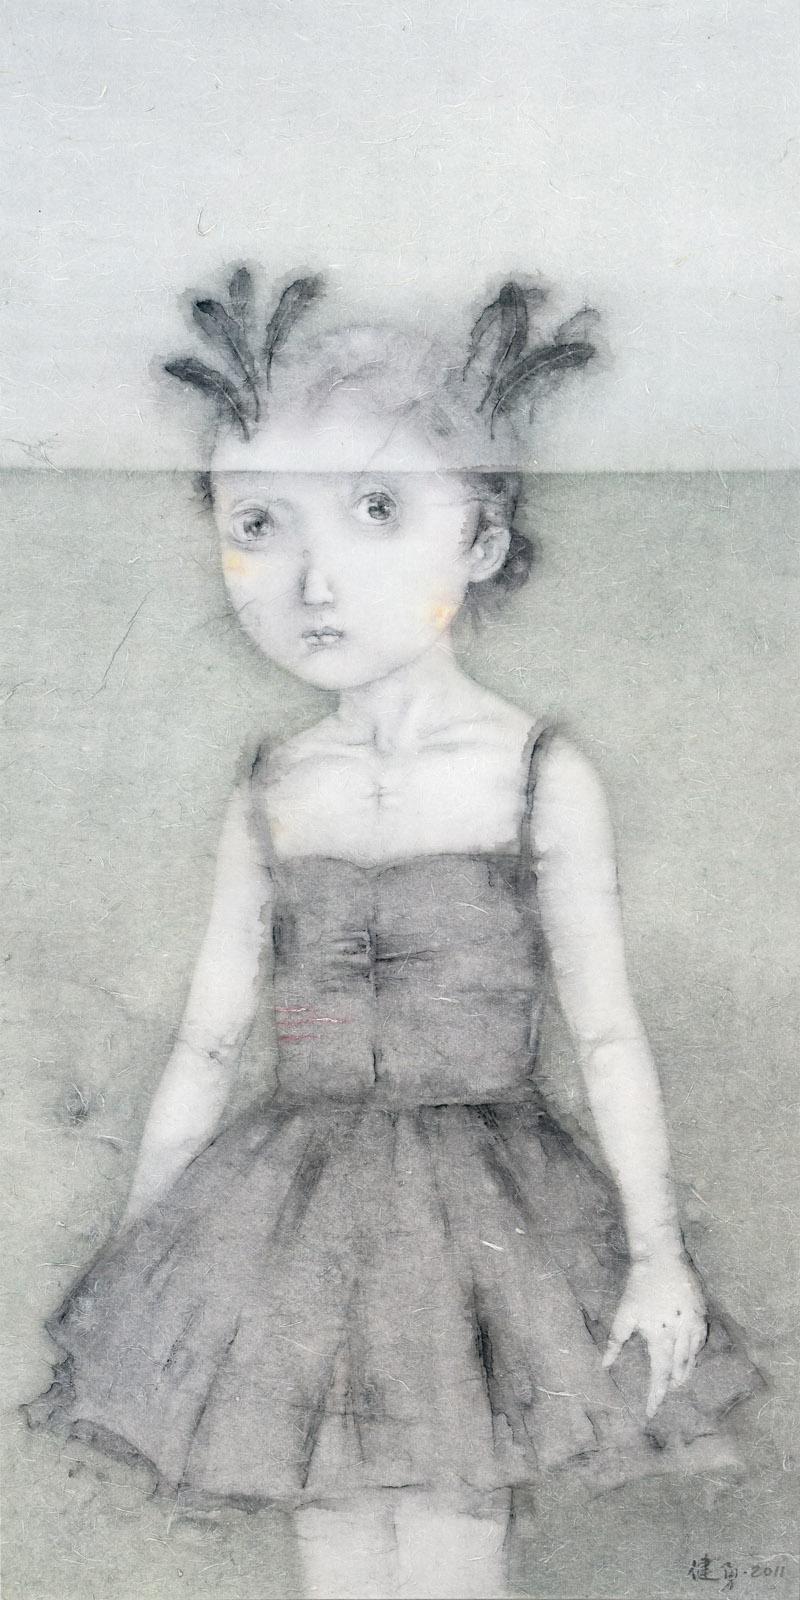 Zeng Jianyong 曾健勇, Cosplay - Black Swan 头号人物 - 黑天鹅, 2011, Ink and color on paper 纸本设色, 144 x 72 cm